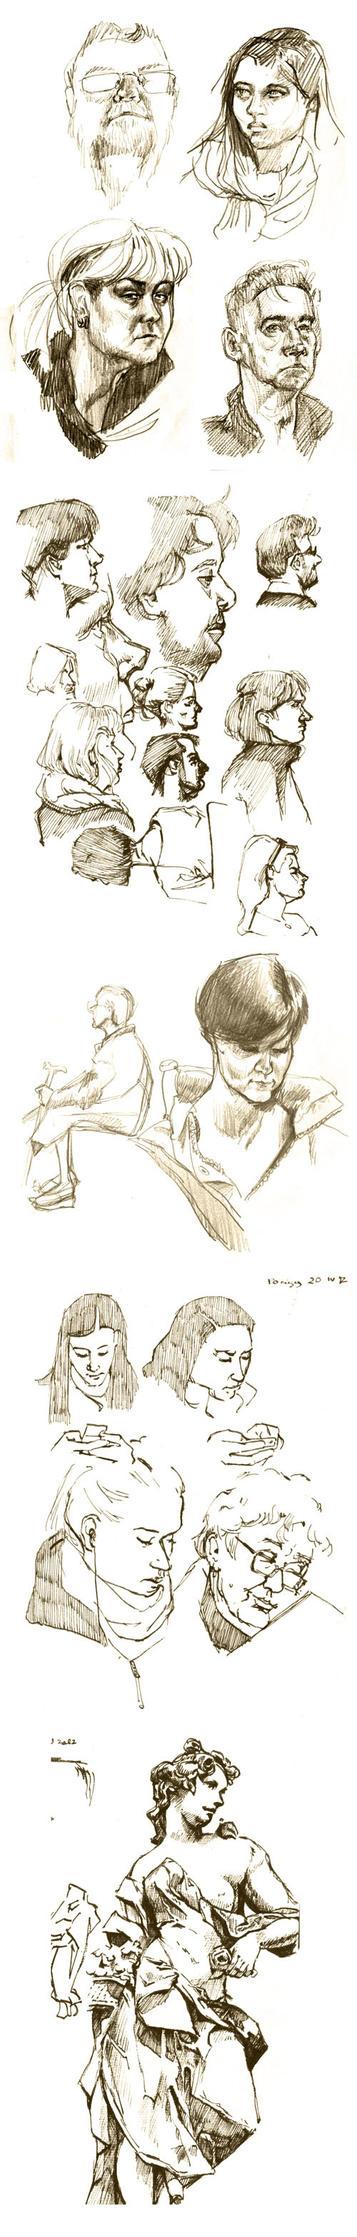 Subway sketching + more by Kidacashanaia